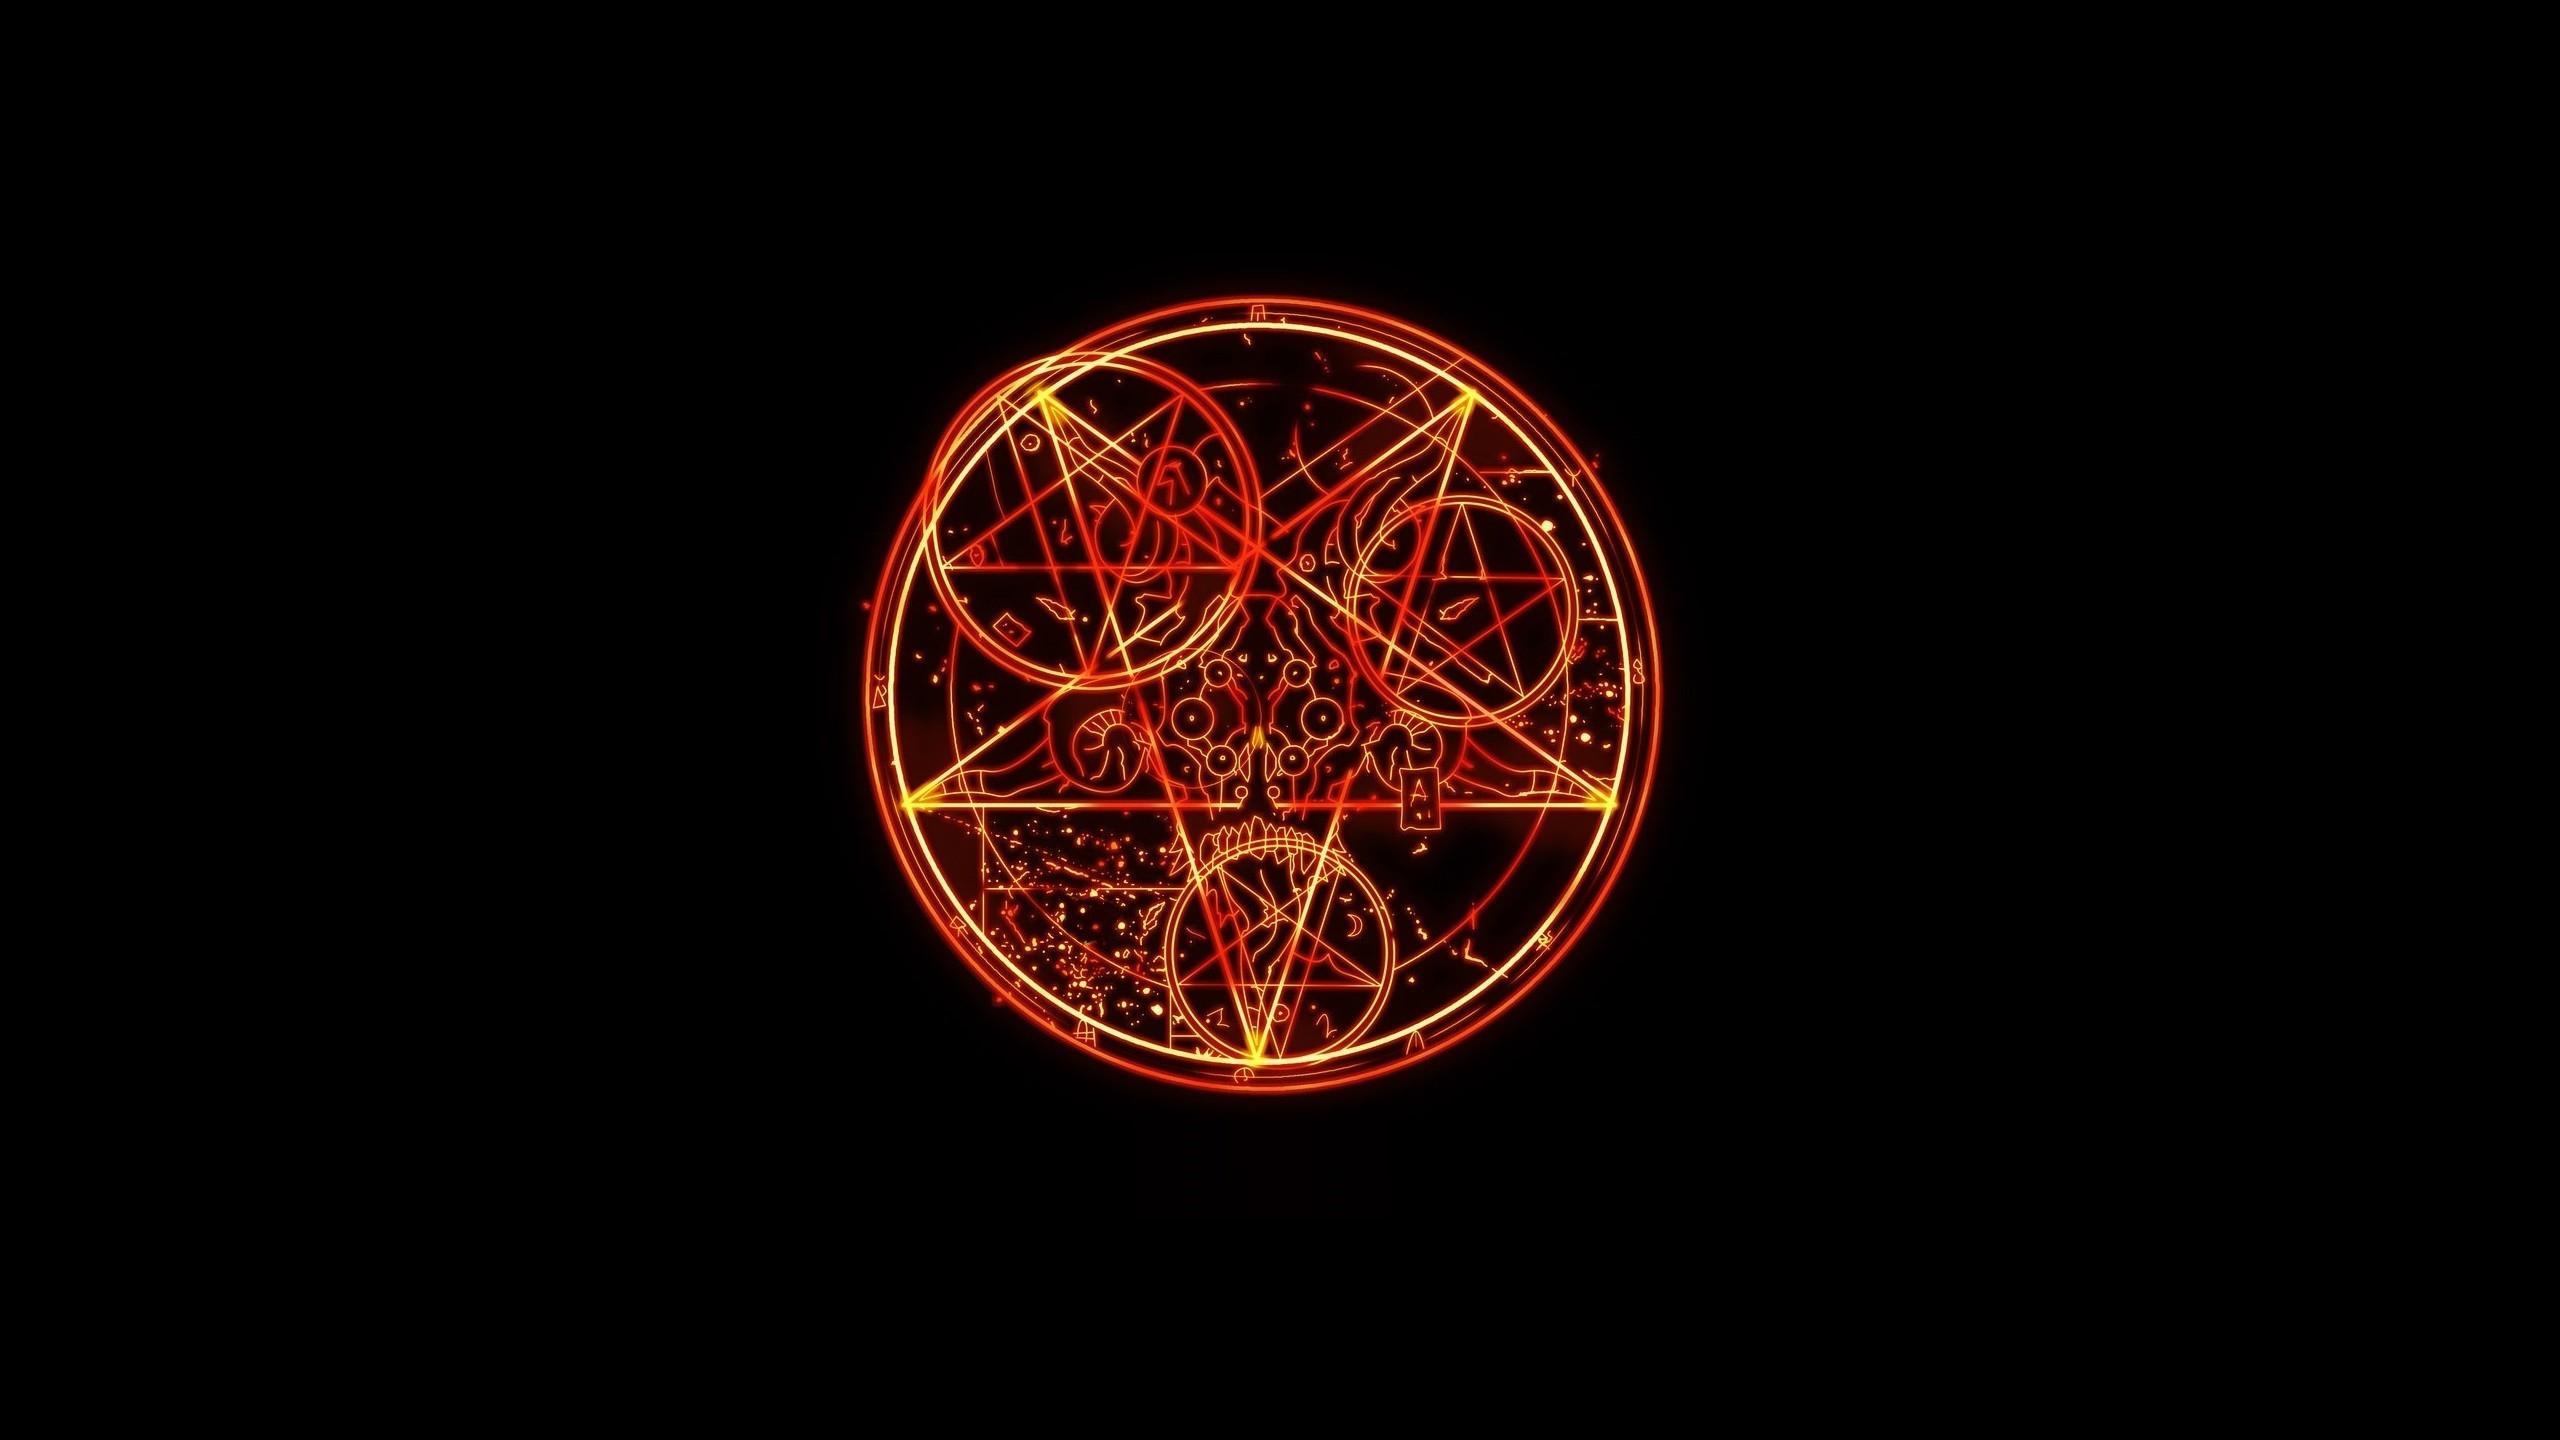 Doom (game), Pentagram, Demon Wallpapers HD / Desktop and Mobile Backgrounds